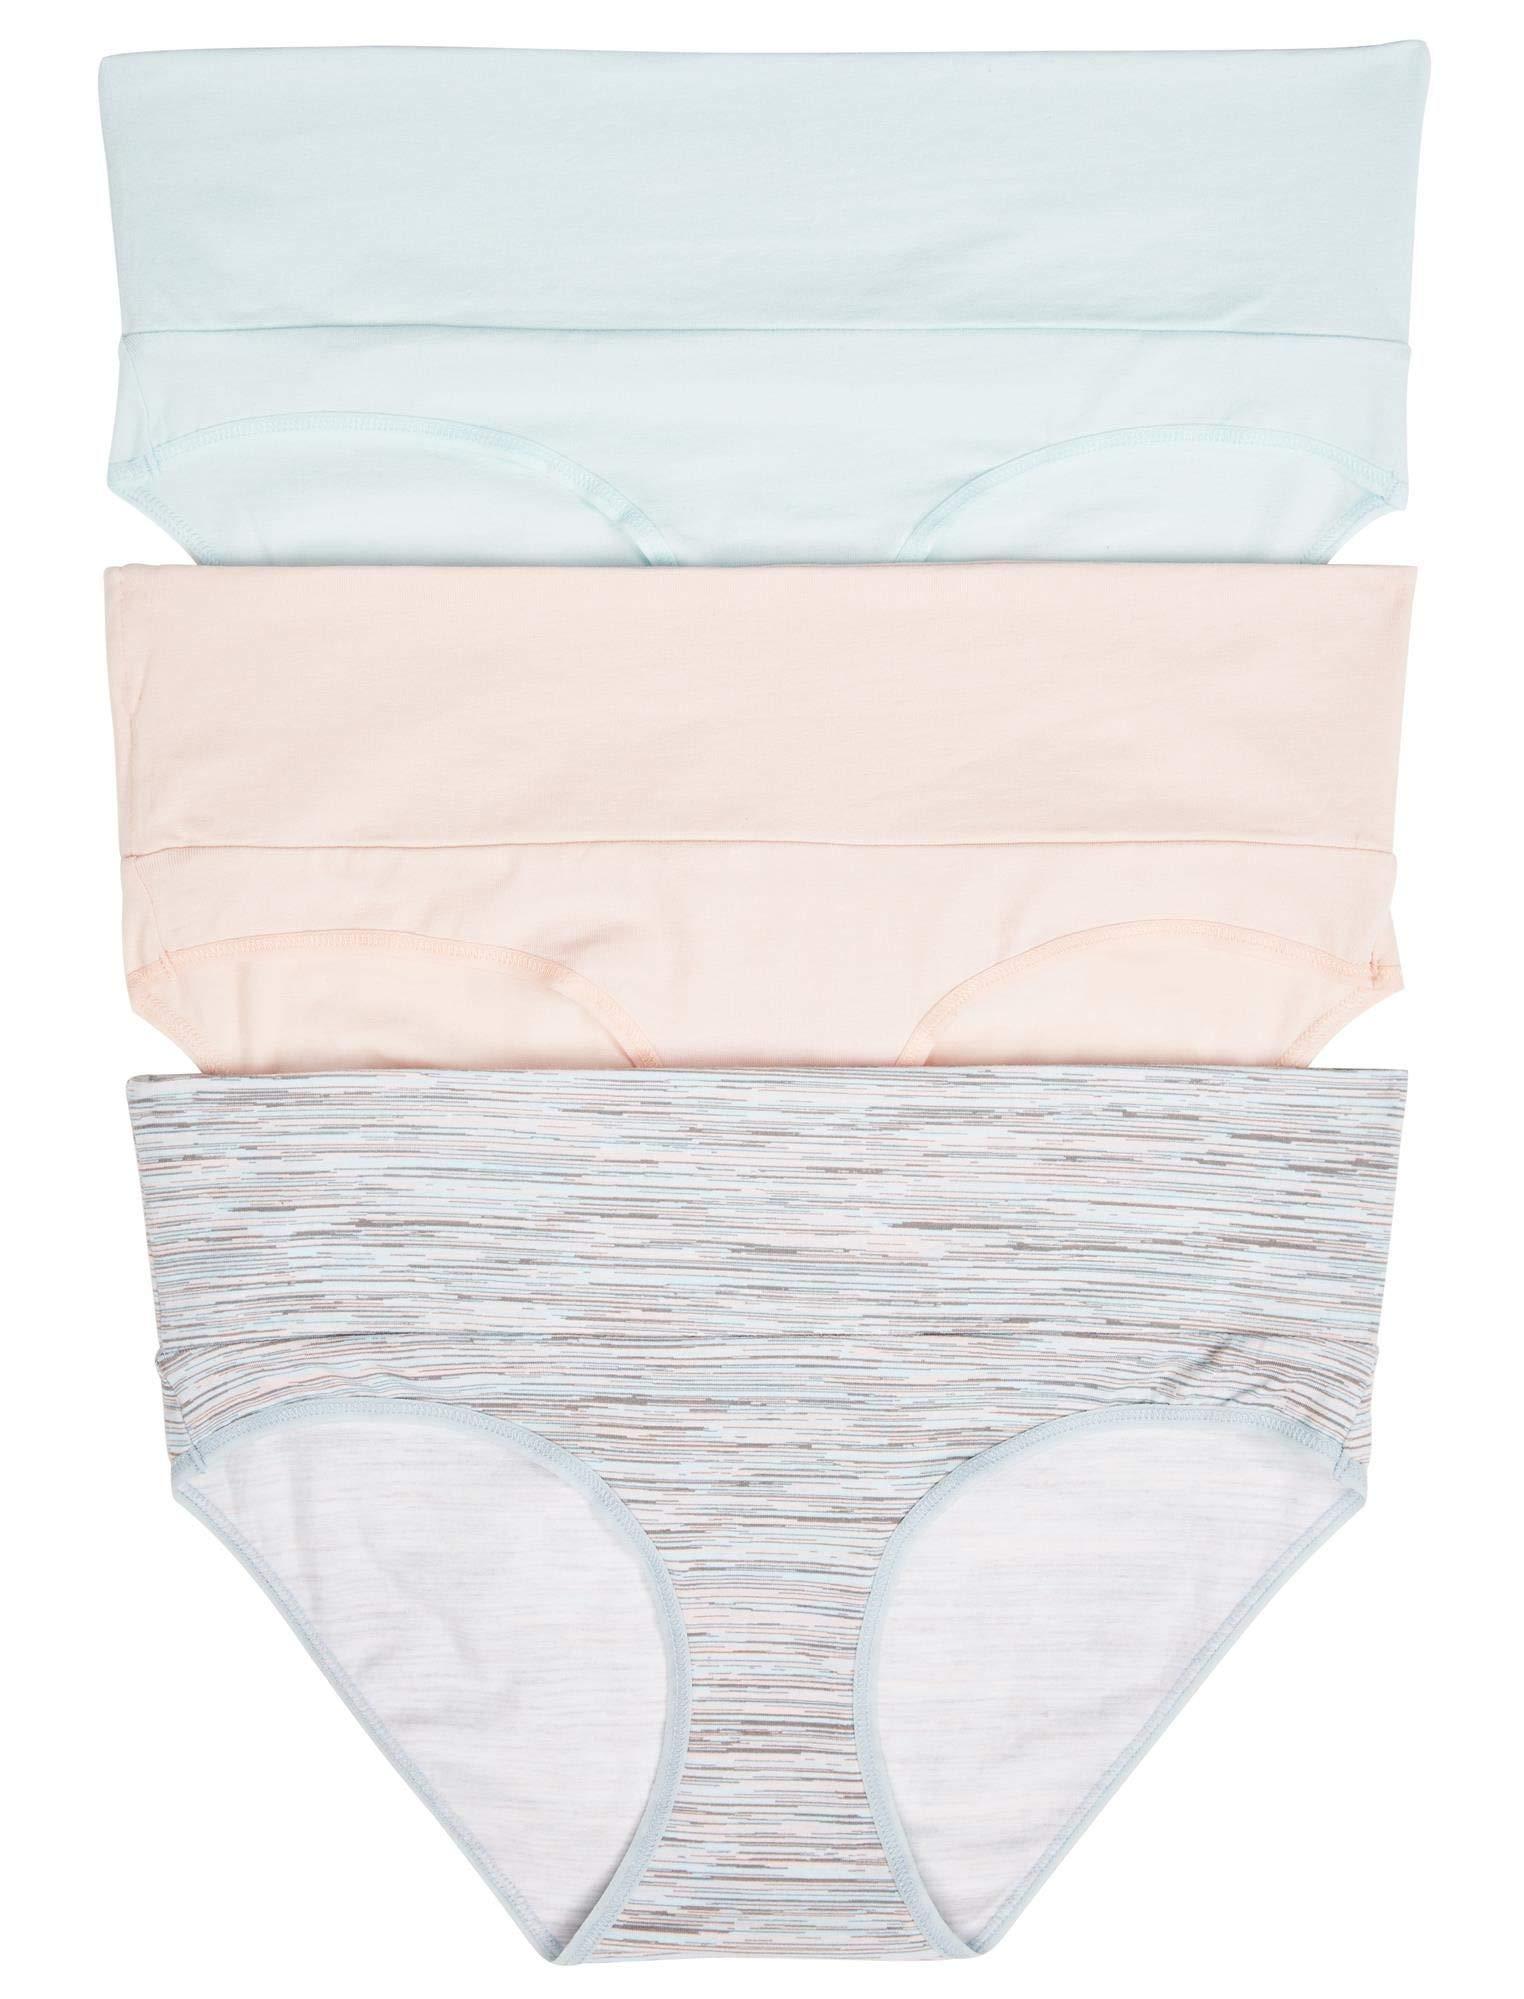 Motherhood Maternity Women's Maternity 3 Pack Fold Over Brief Panties, Aqua, Space Dye, Pink/Multi Pack, Medium